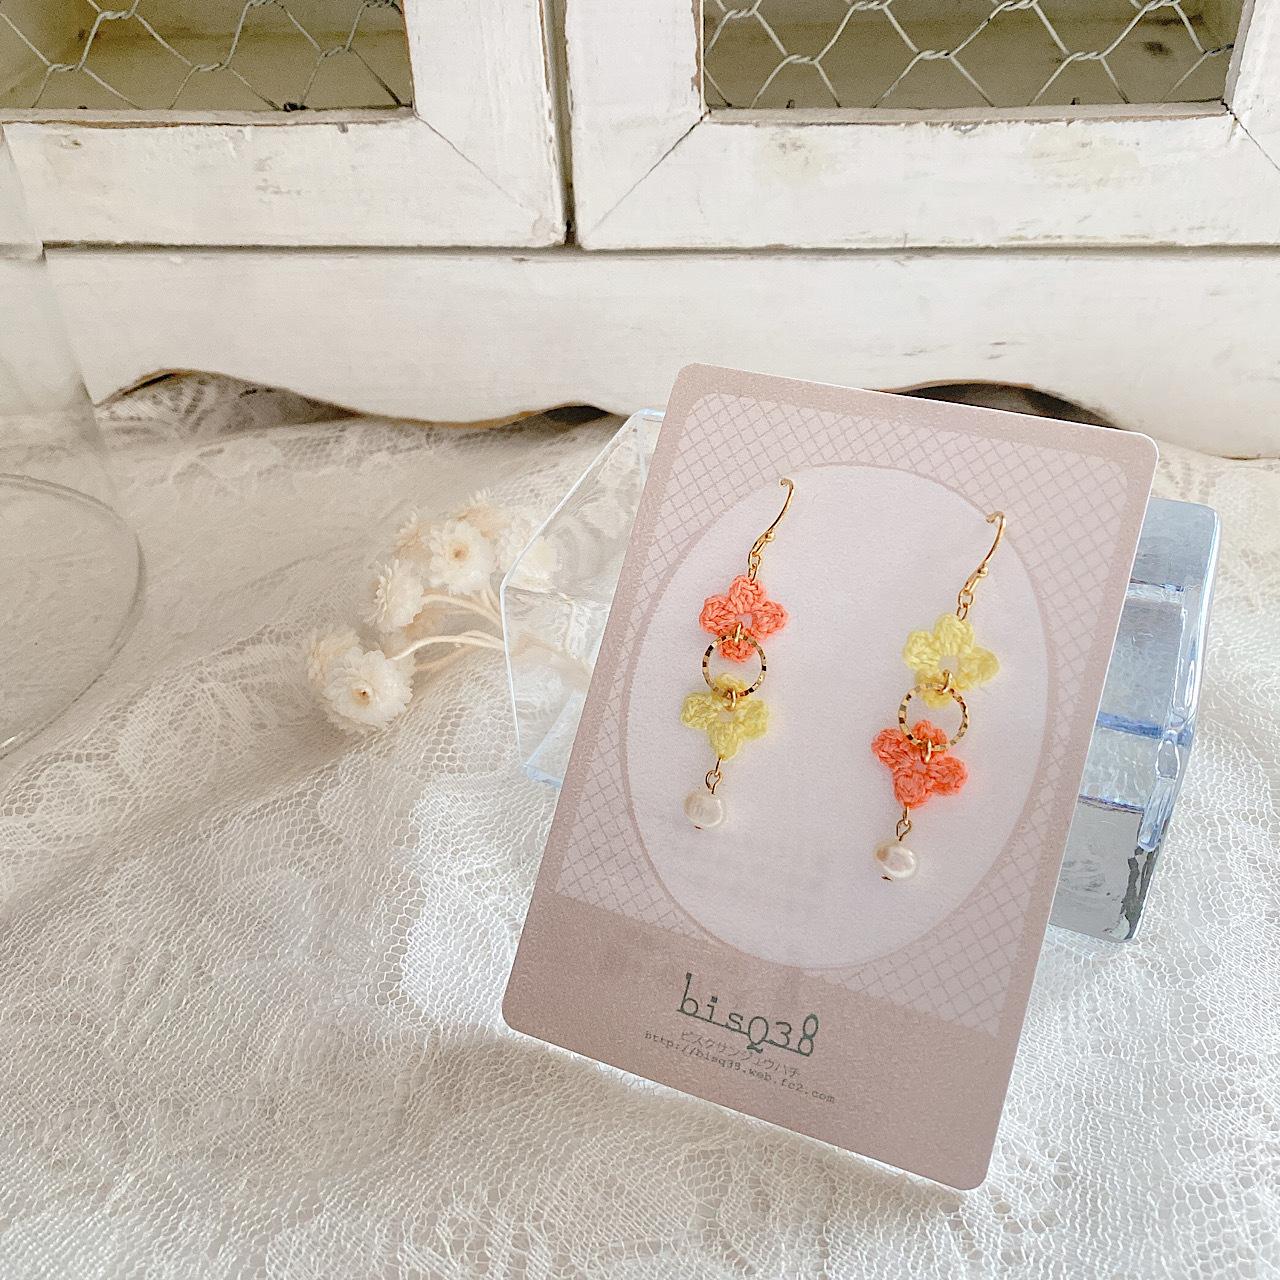 【bisQ38】ボタンフラワー耳飾り(ピンク)ピアス⇔イヤリング変更可